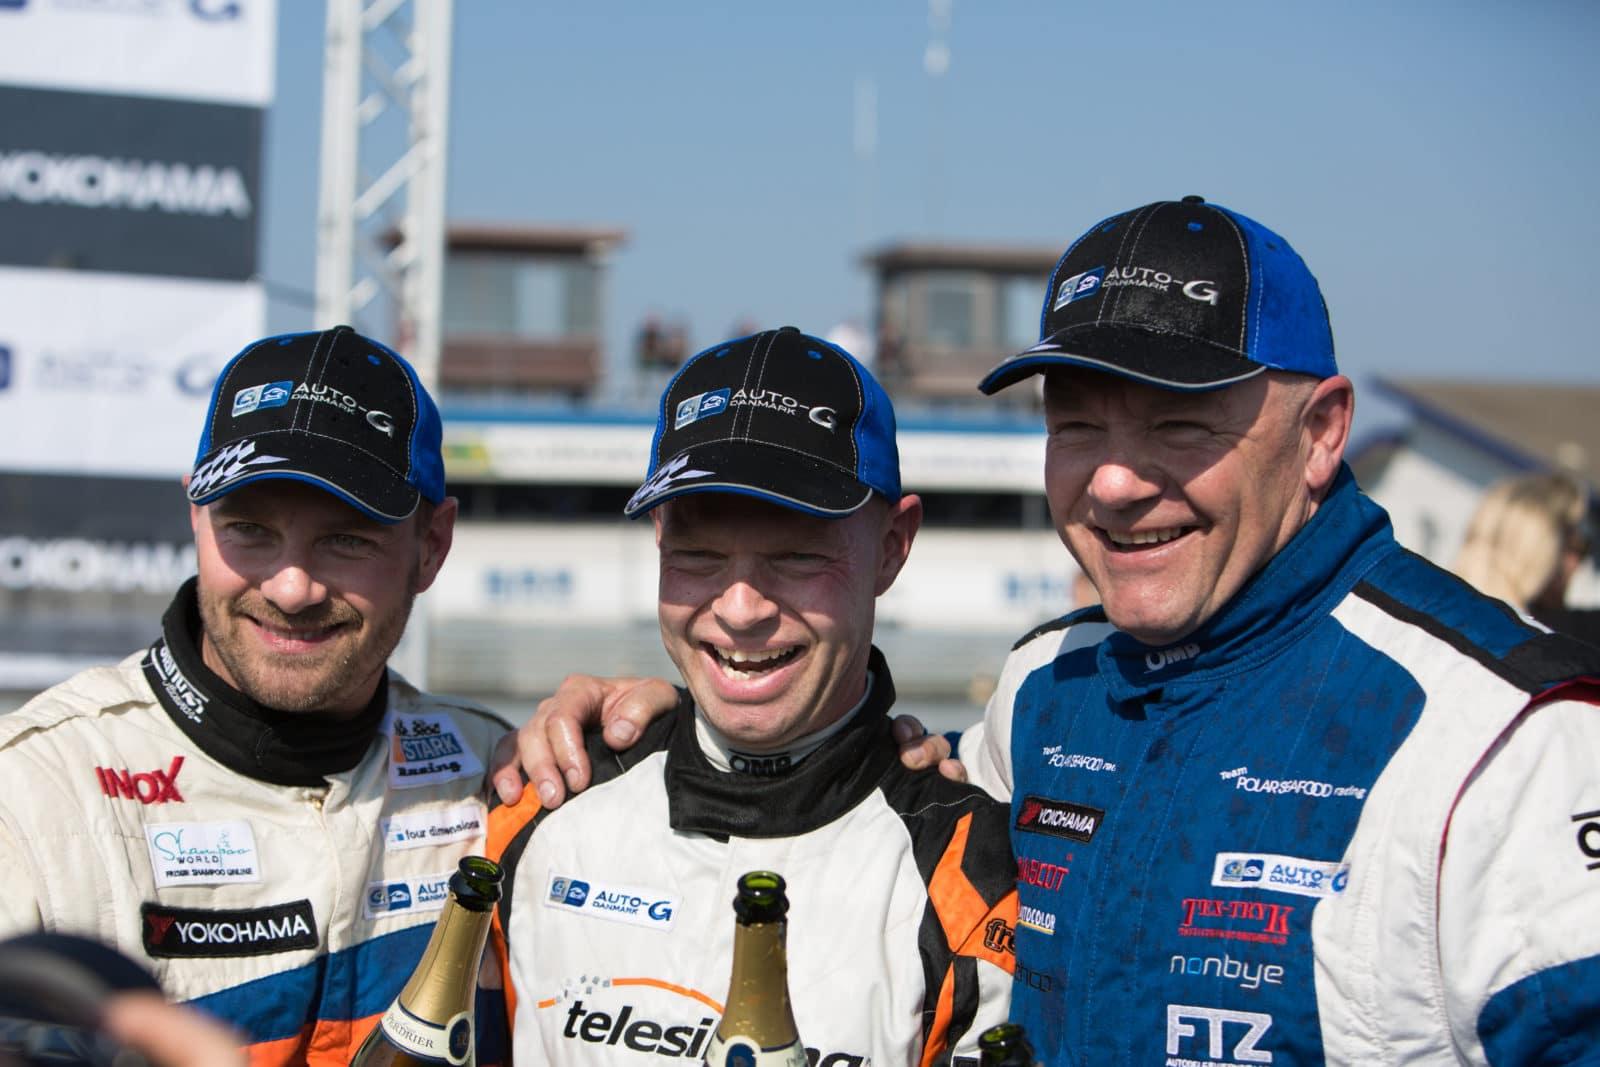 Casper Elgaard, Jan Magnussen, John Nielsen DTC Åbningsløbet 2014 Foto: Thomas Norsted / Racemag